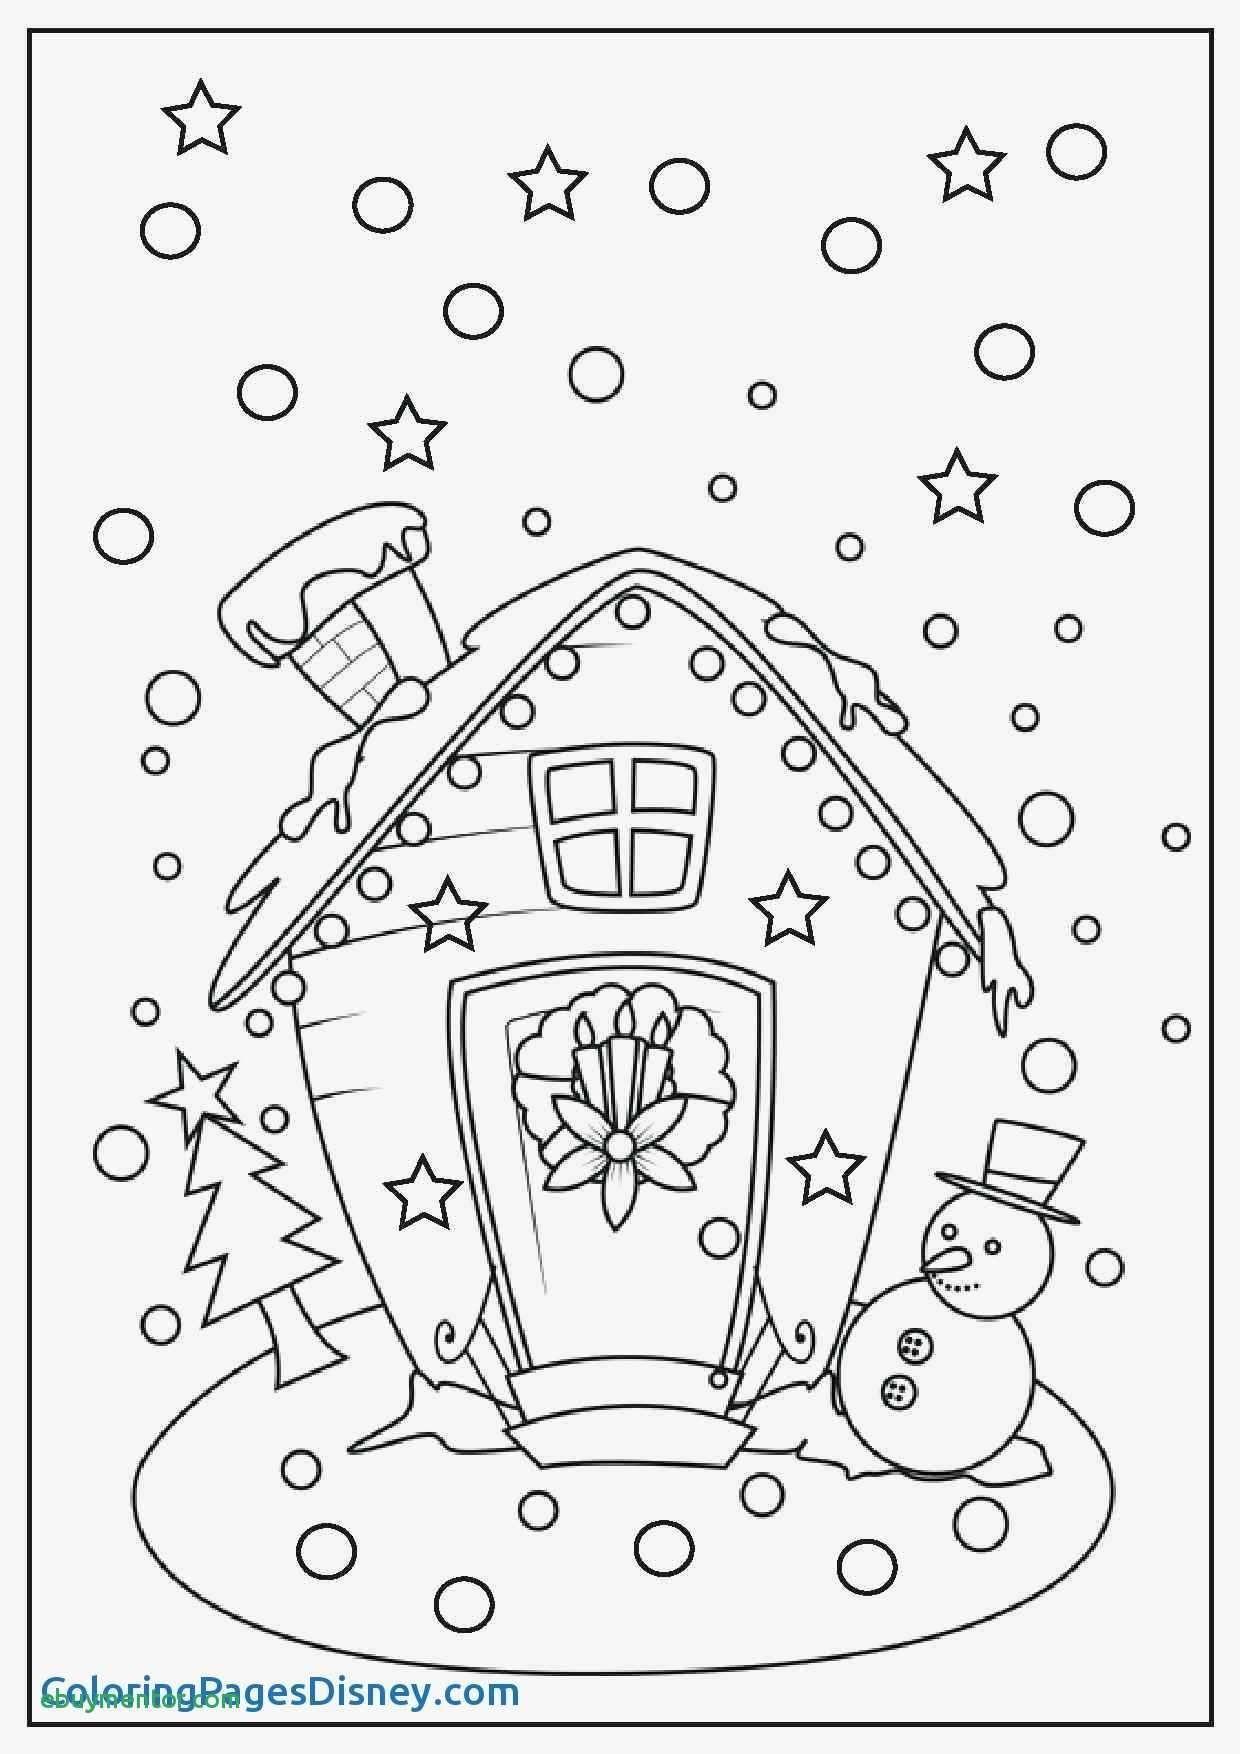 21 Best Of Free Printable Kindergarten Books - Pexels Photo - Free Printable Christmas Books For Kindergarten